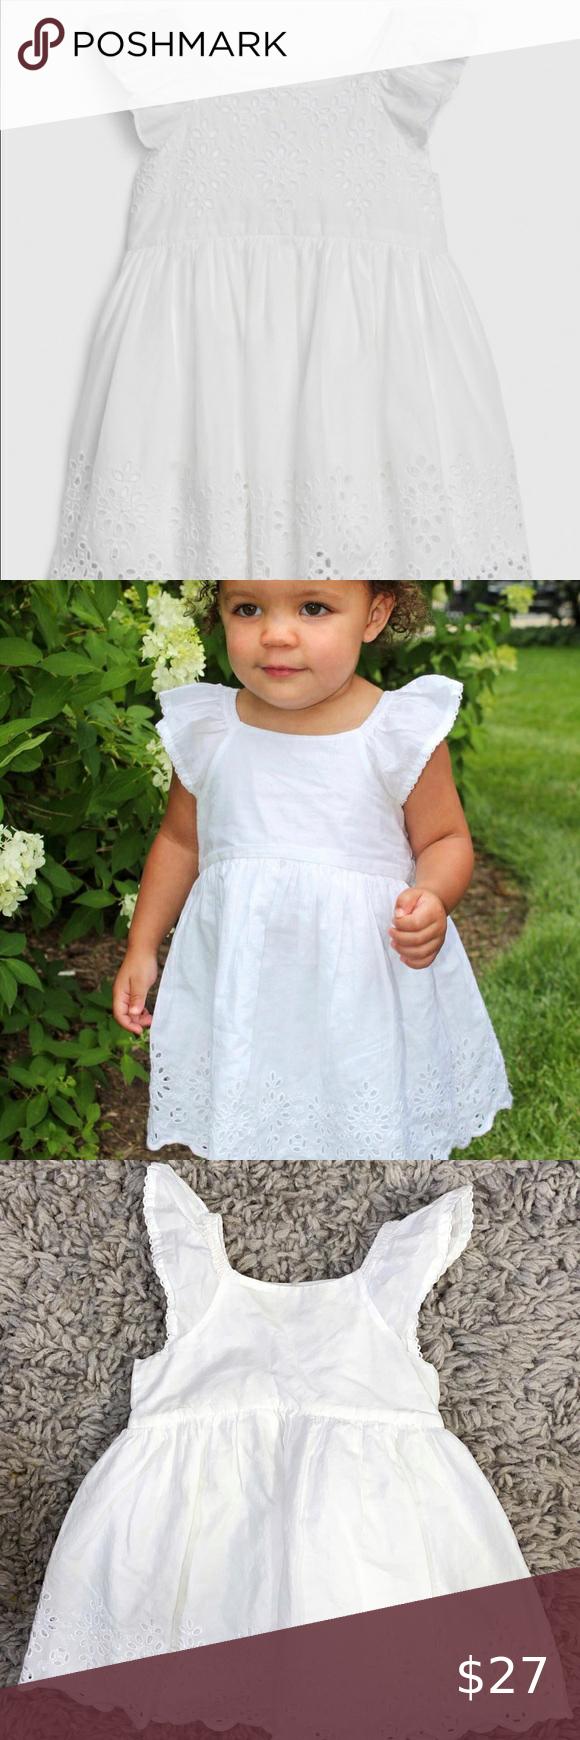 12 18m Baby Gap White Eyelet Summer Dress Summer Dresses Dresses Gap Dress [ 1740 x 580 Pixel ]